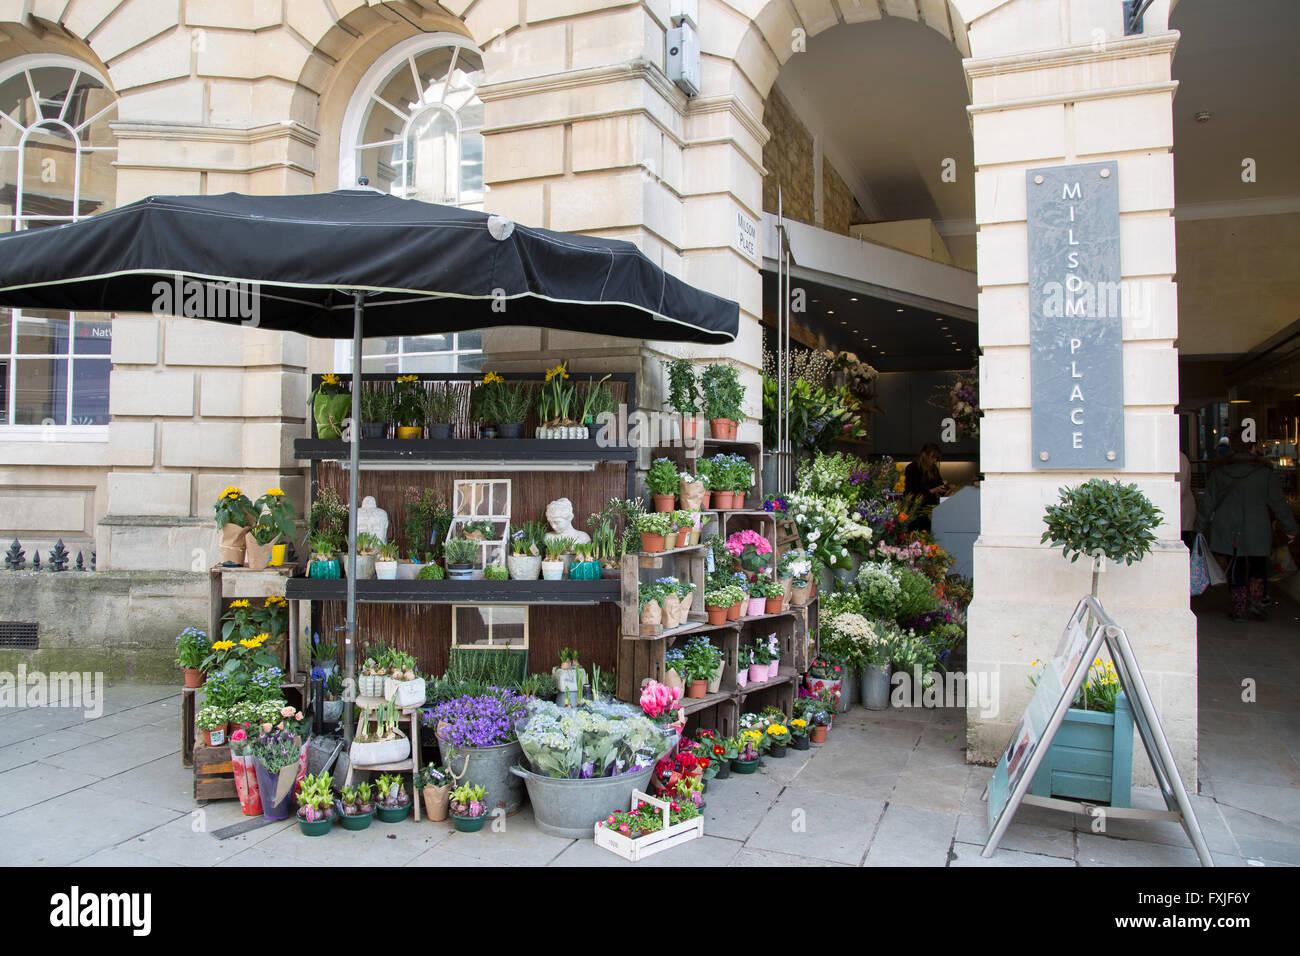 2e3155eab7e1 Milsom Place Florist; Bath; England; UK Stock Photo: 102439987 - Alamy